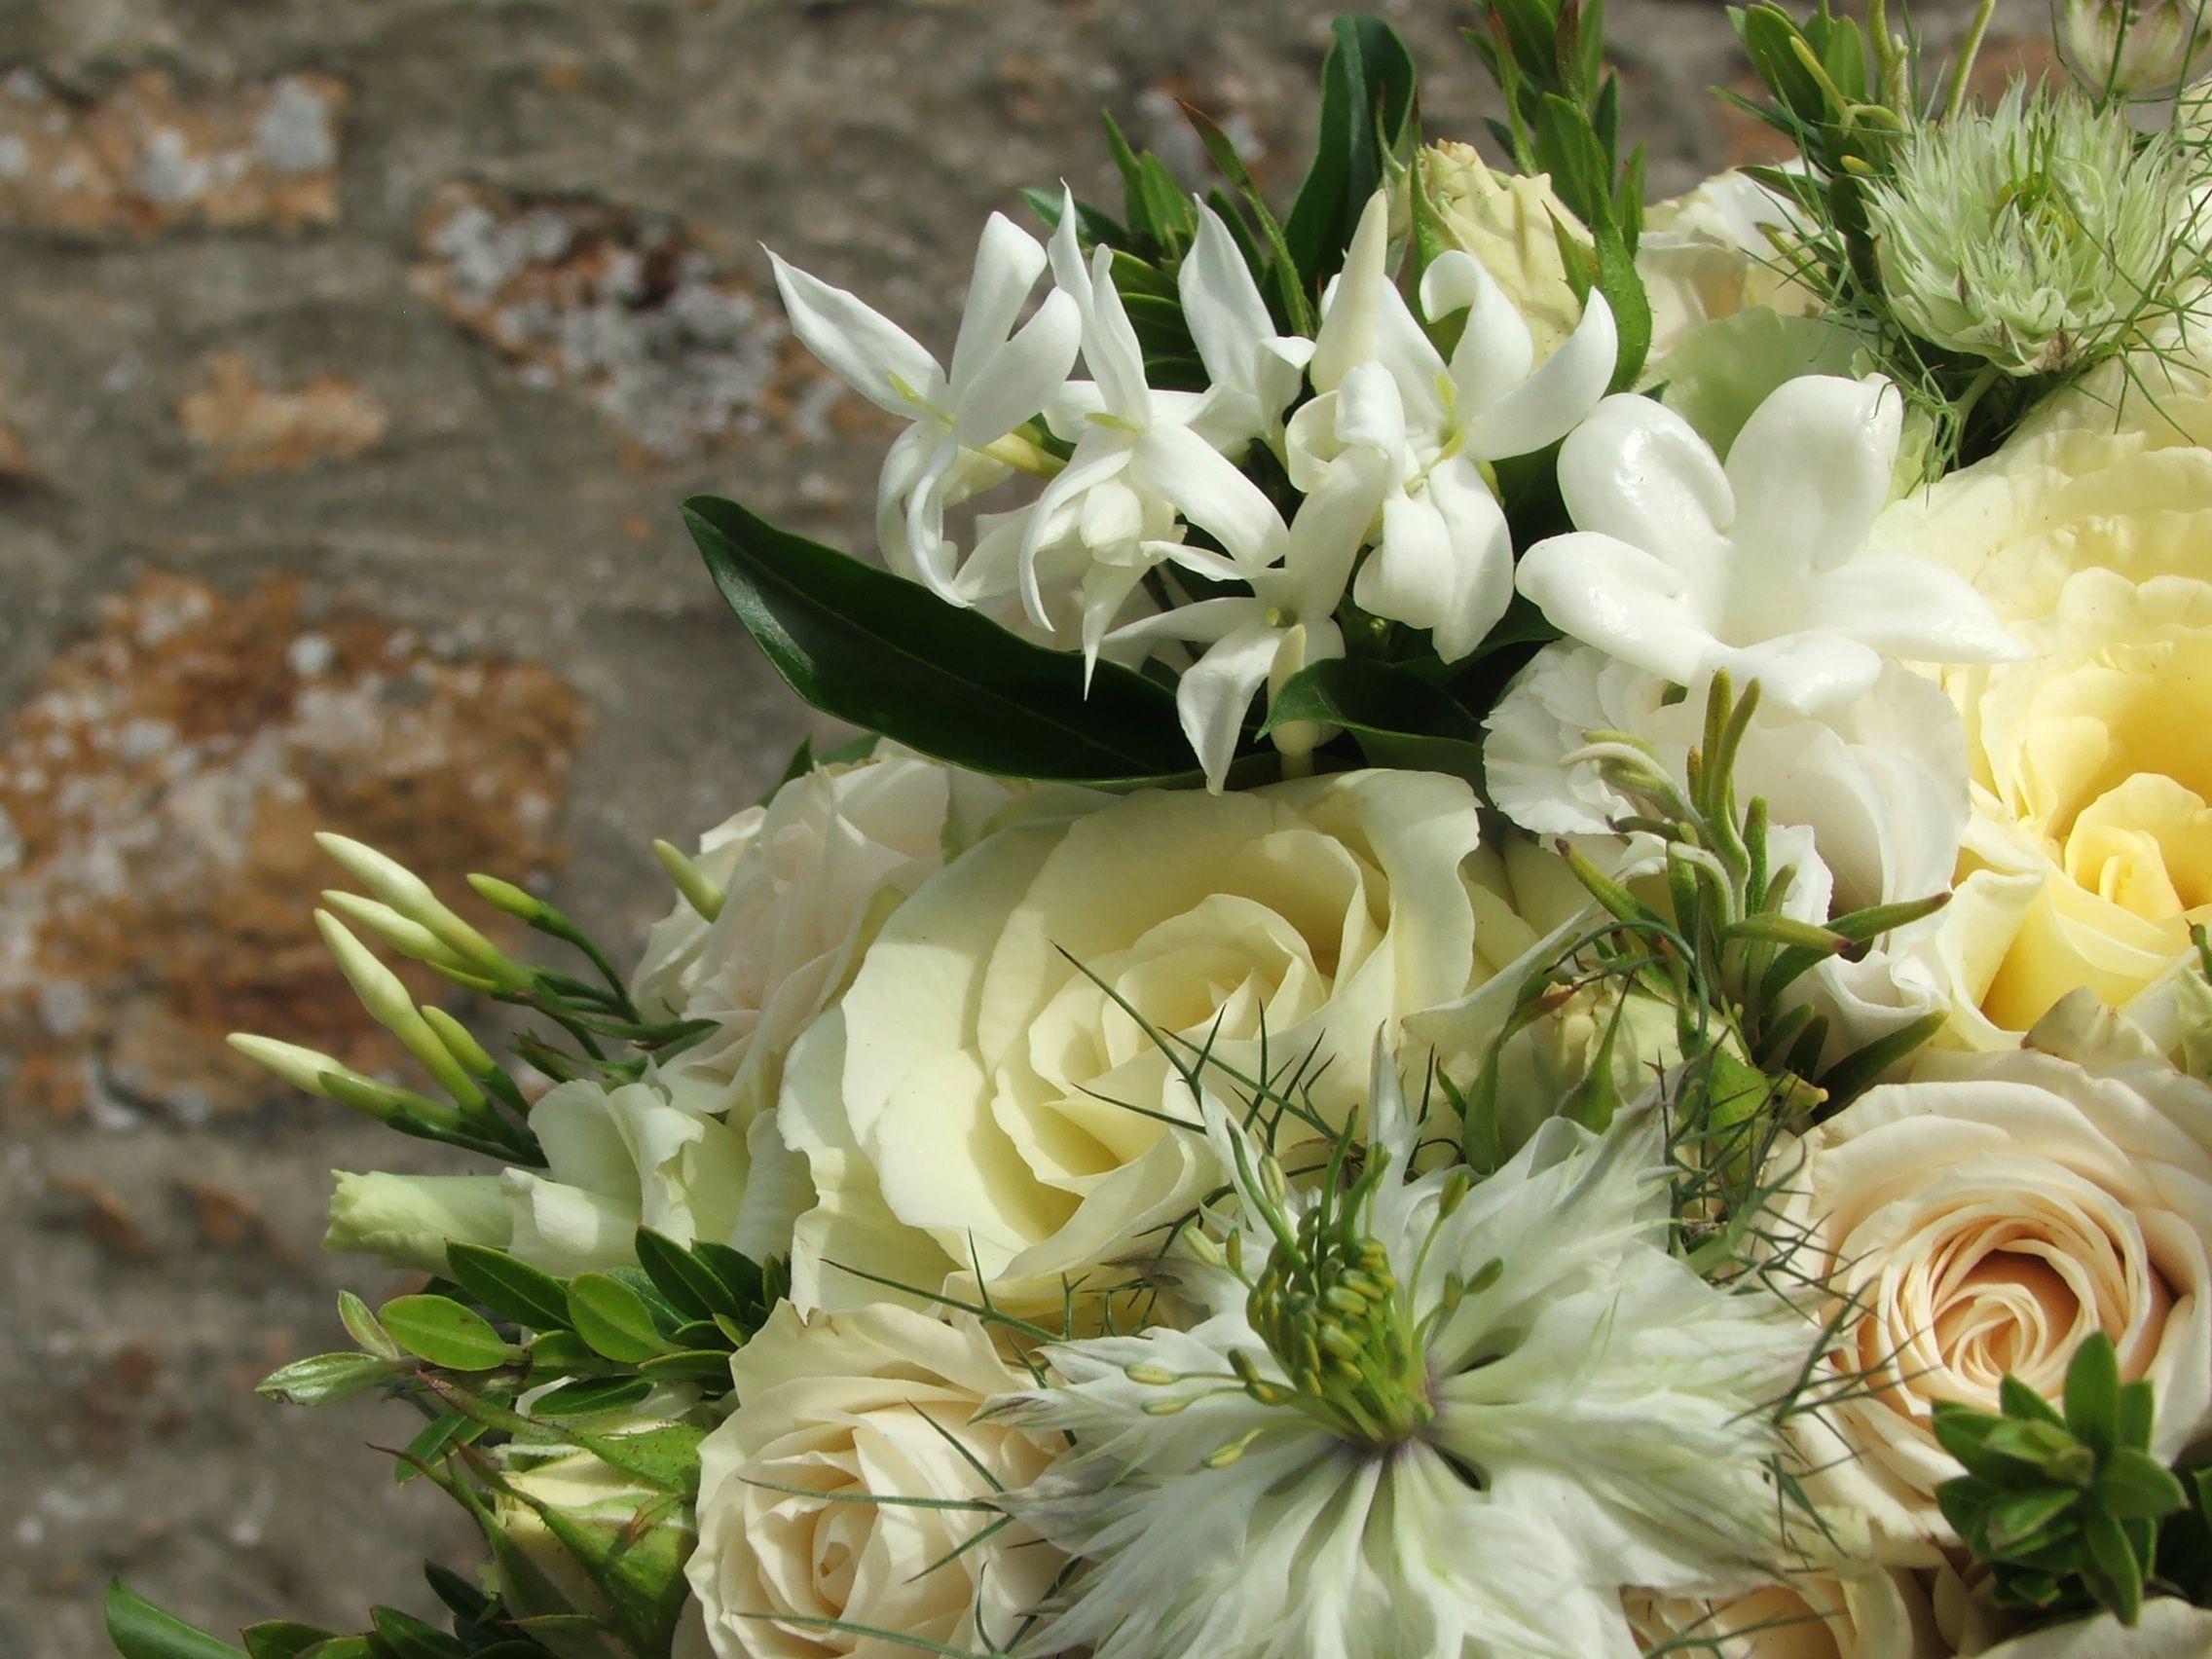 Delicate flower combination that could work well for the bridal delicate flower combination that could work well for the bridal bouquet jasmine nigella izmirmasajfo